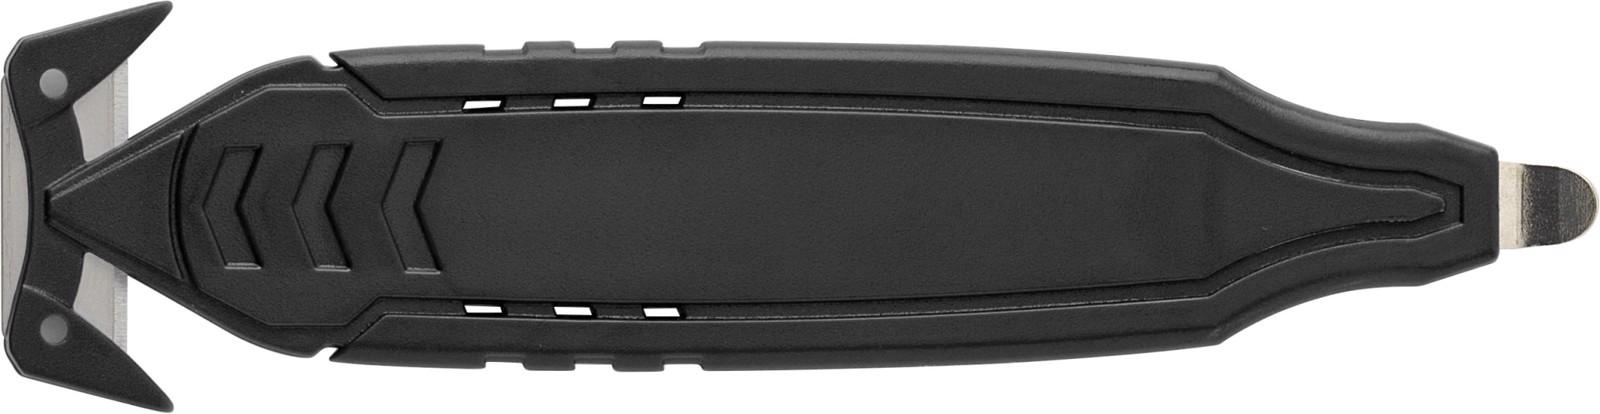 ABS foil cutter - Black